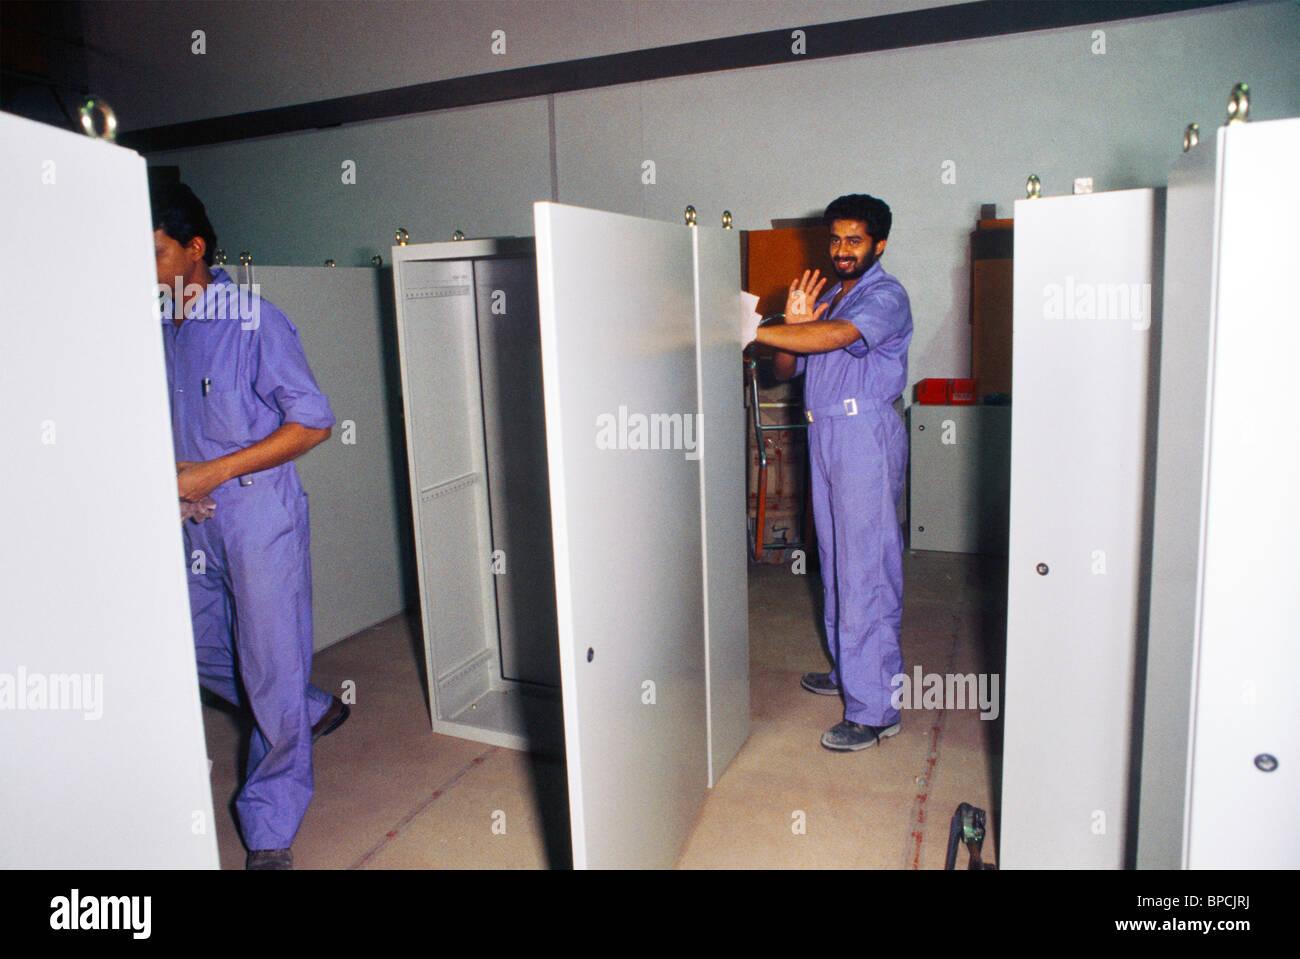 Dubai UAE Jebel Ali Free Trade Zone Metal Box Factory Finishing Cabinets Stock Photo